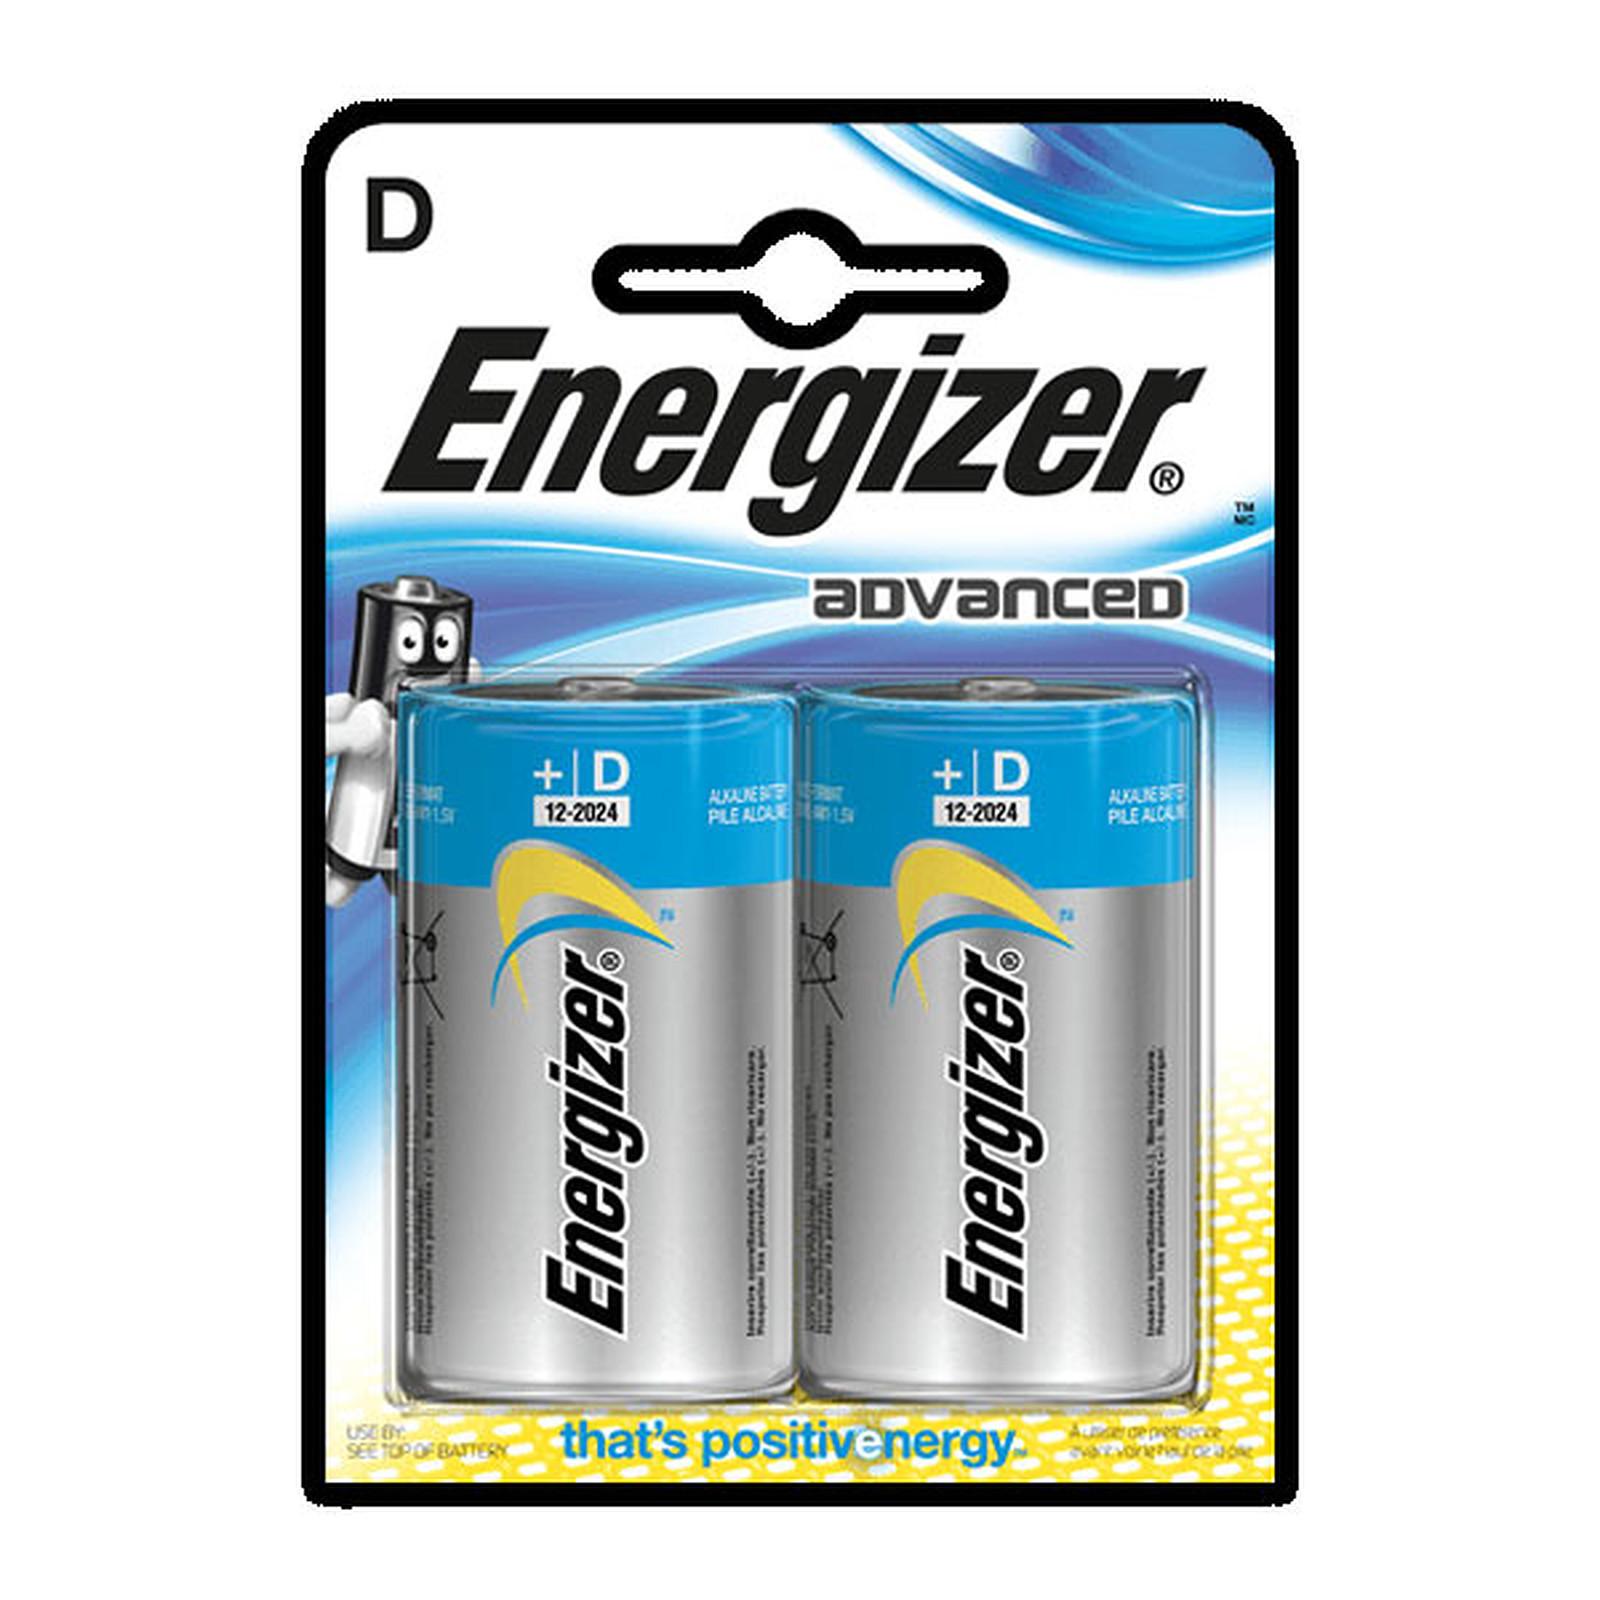 Energizer Advanced D (2 unidades)